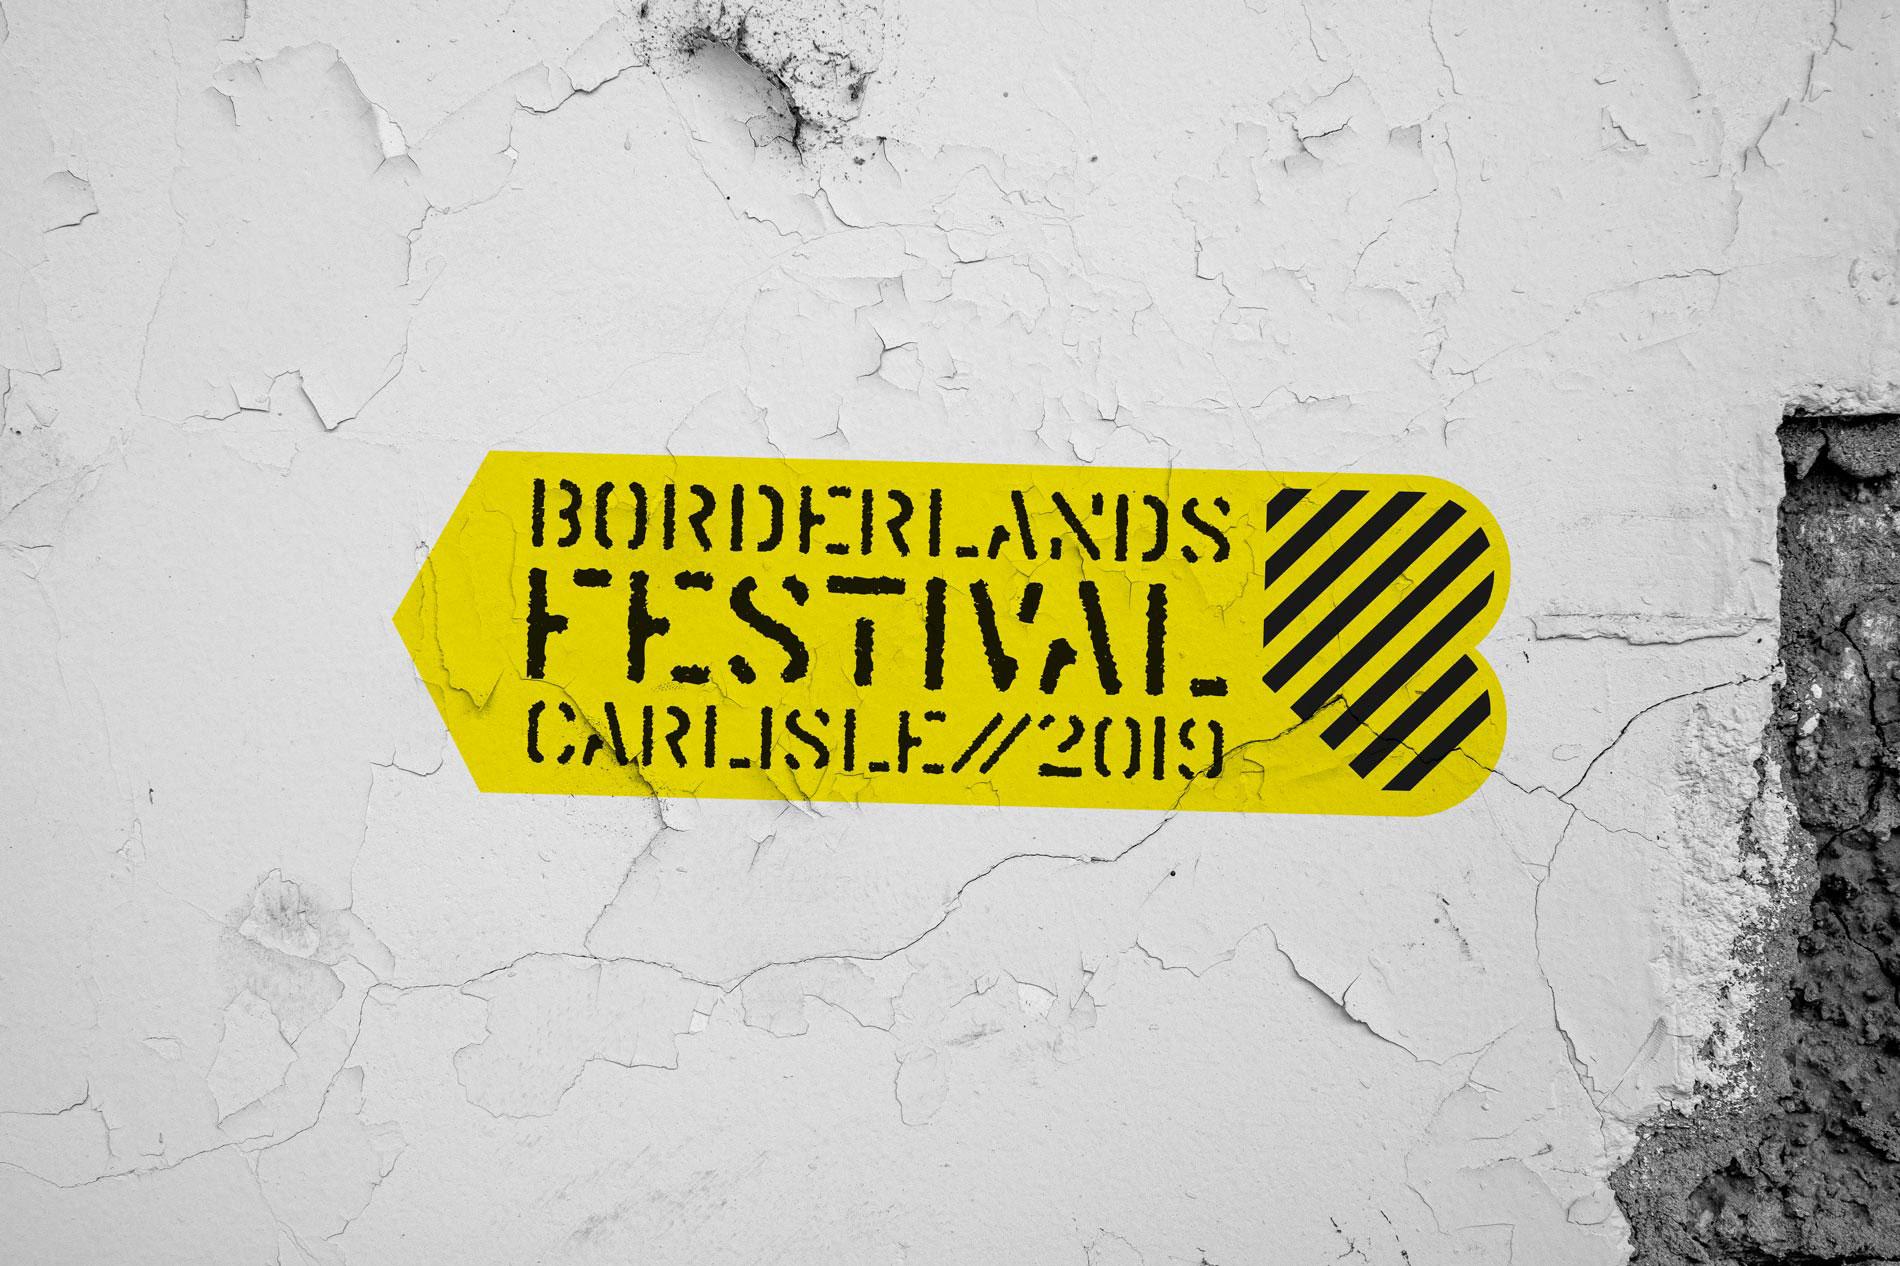 Eden Arts Borderlands 2019 Brand Identity Concepts Carlisle